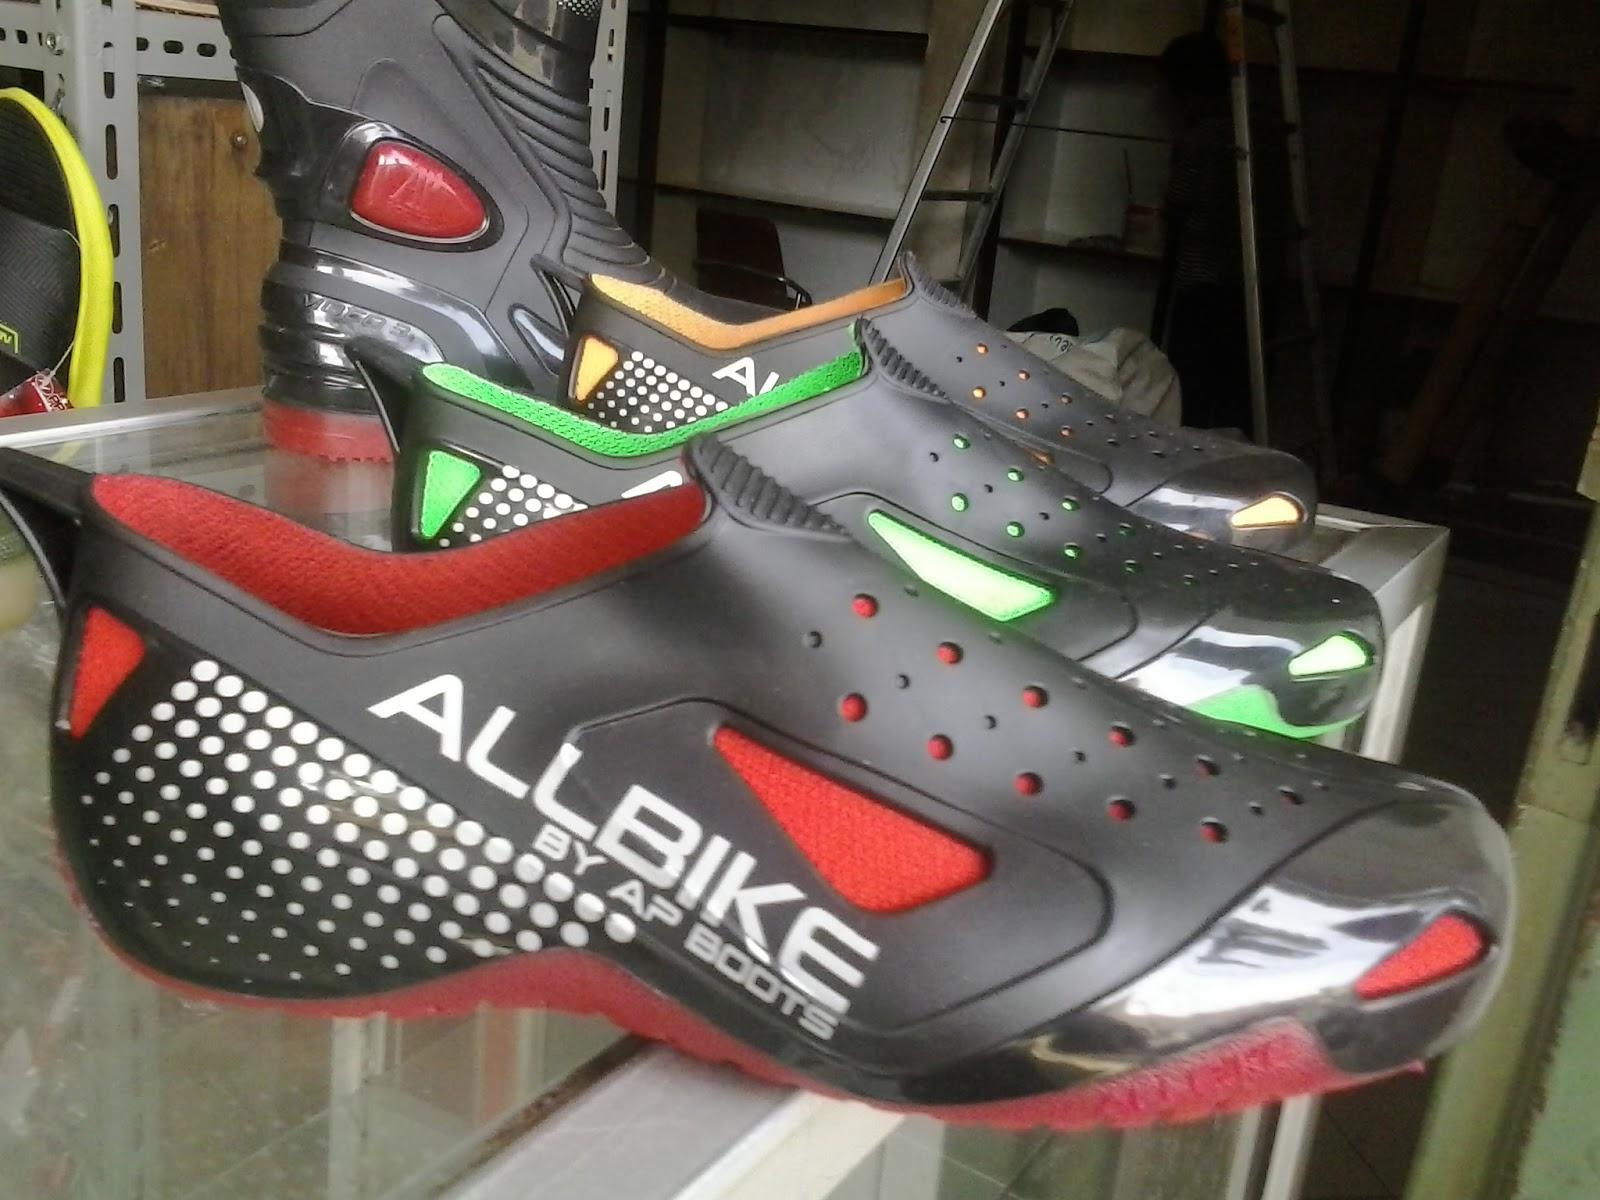 Harga Jual Sepatu Cross Asli Karet Att Rp600000 Merk Dan Ready Ap Boots Moto